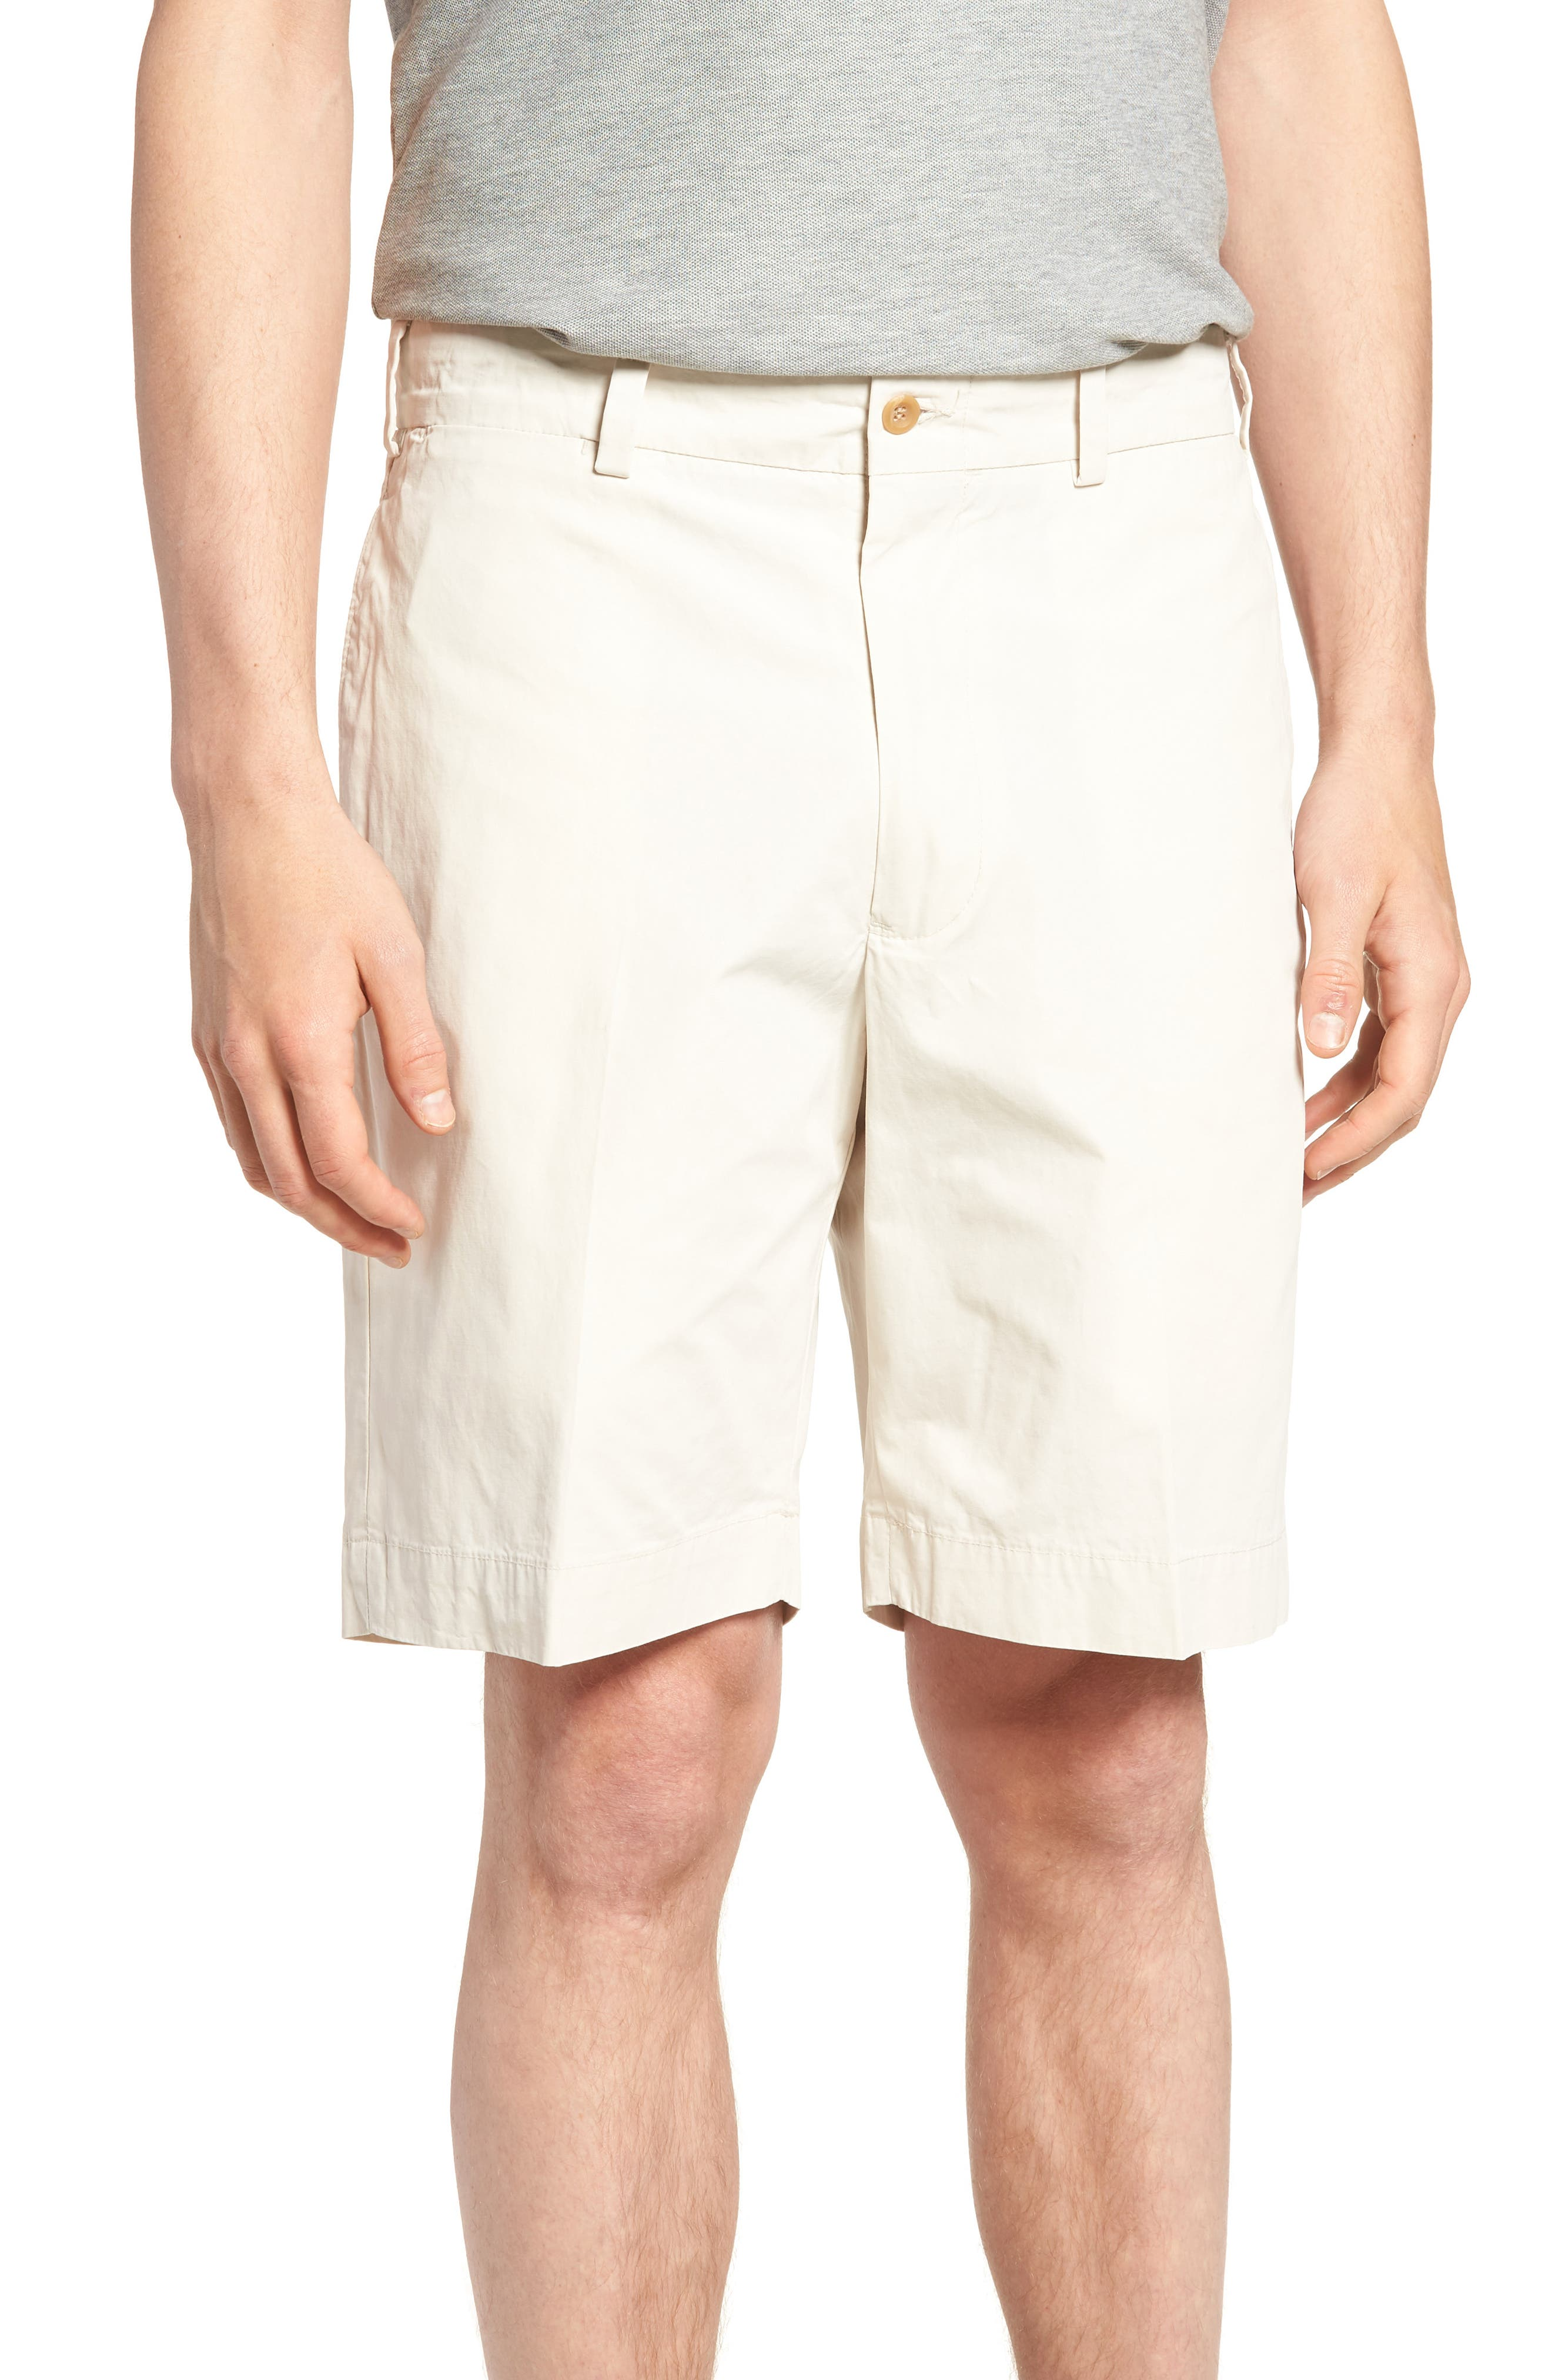 M2 Standard Fit Flat Front Tropical Cotton Poplin Shorts,                             Main thumbnail 1, color,                             280